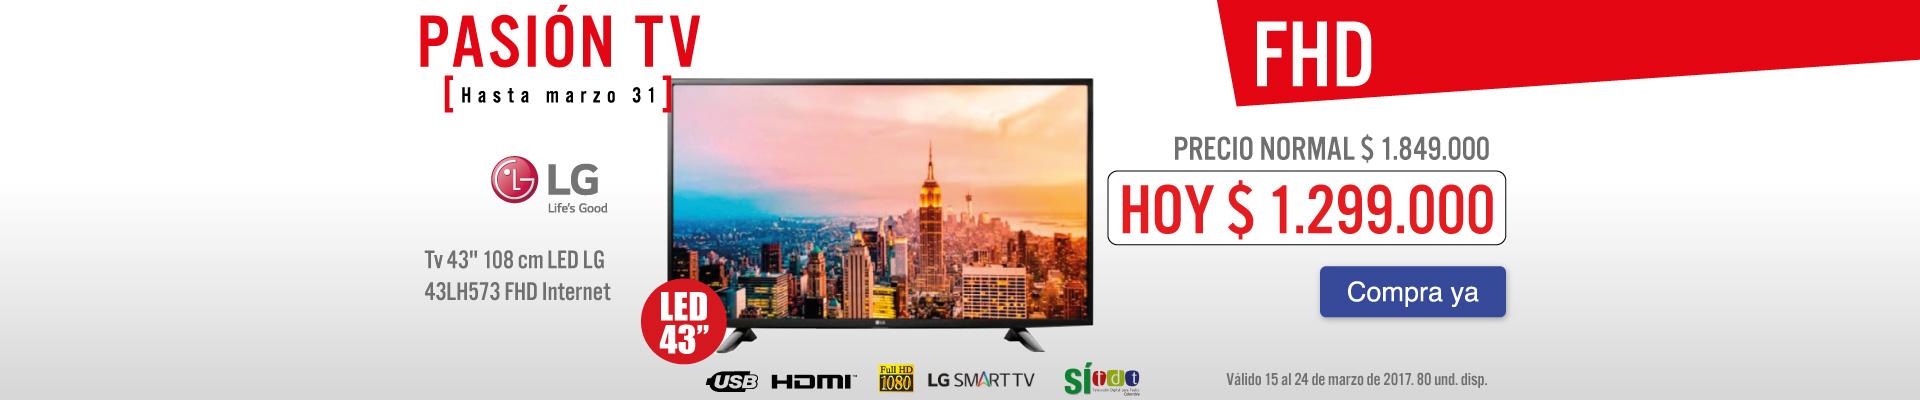 PPAL KT - TV 40FHDLT2 - MRZ 22